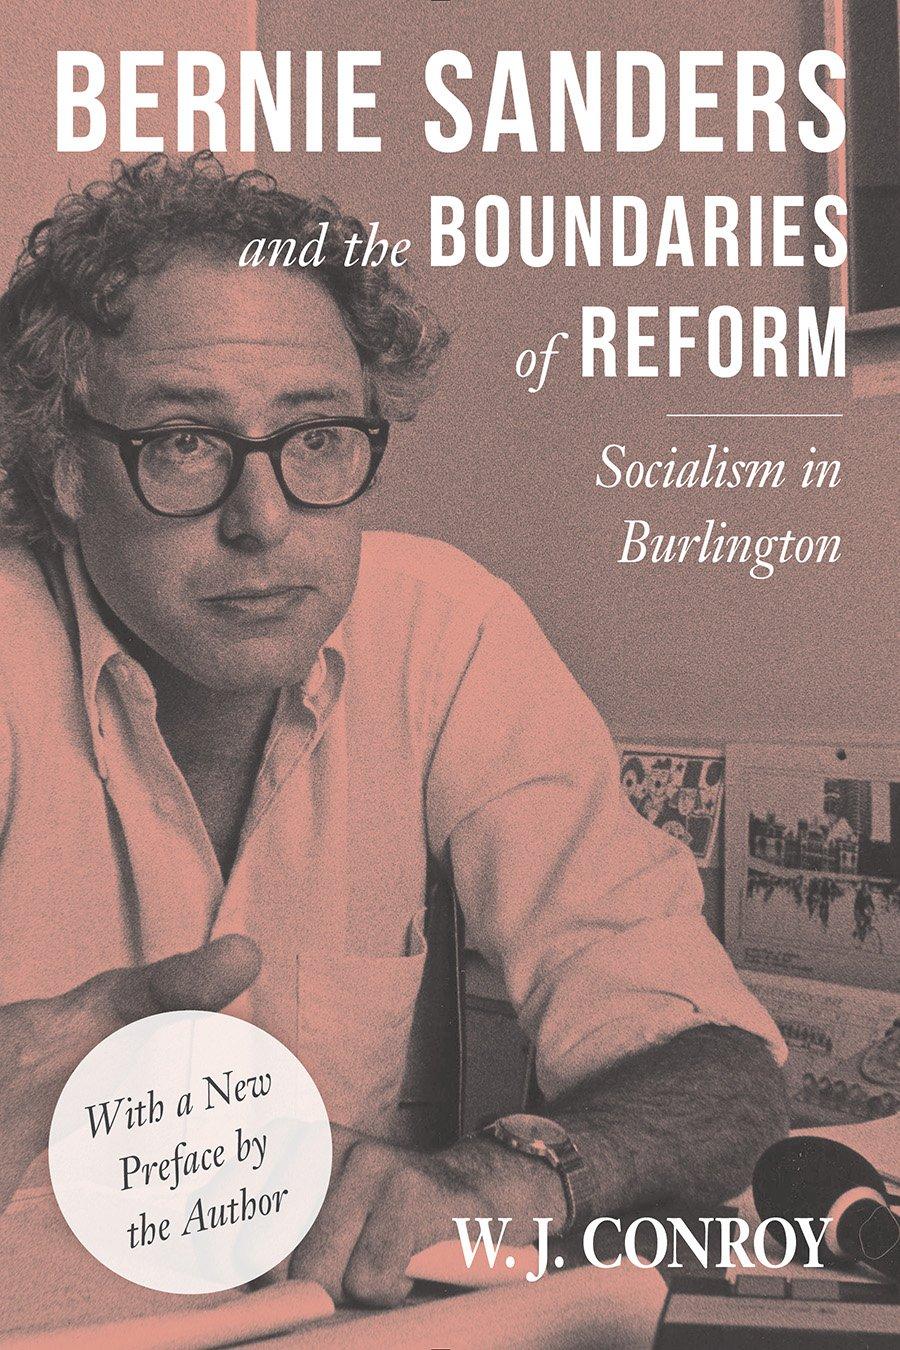 Download Bernie Sanders and the Boundaries of Reform: Socialism in Burlington (Conflicts In Urban & Regional) PDF